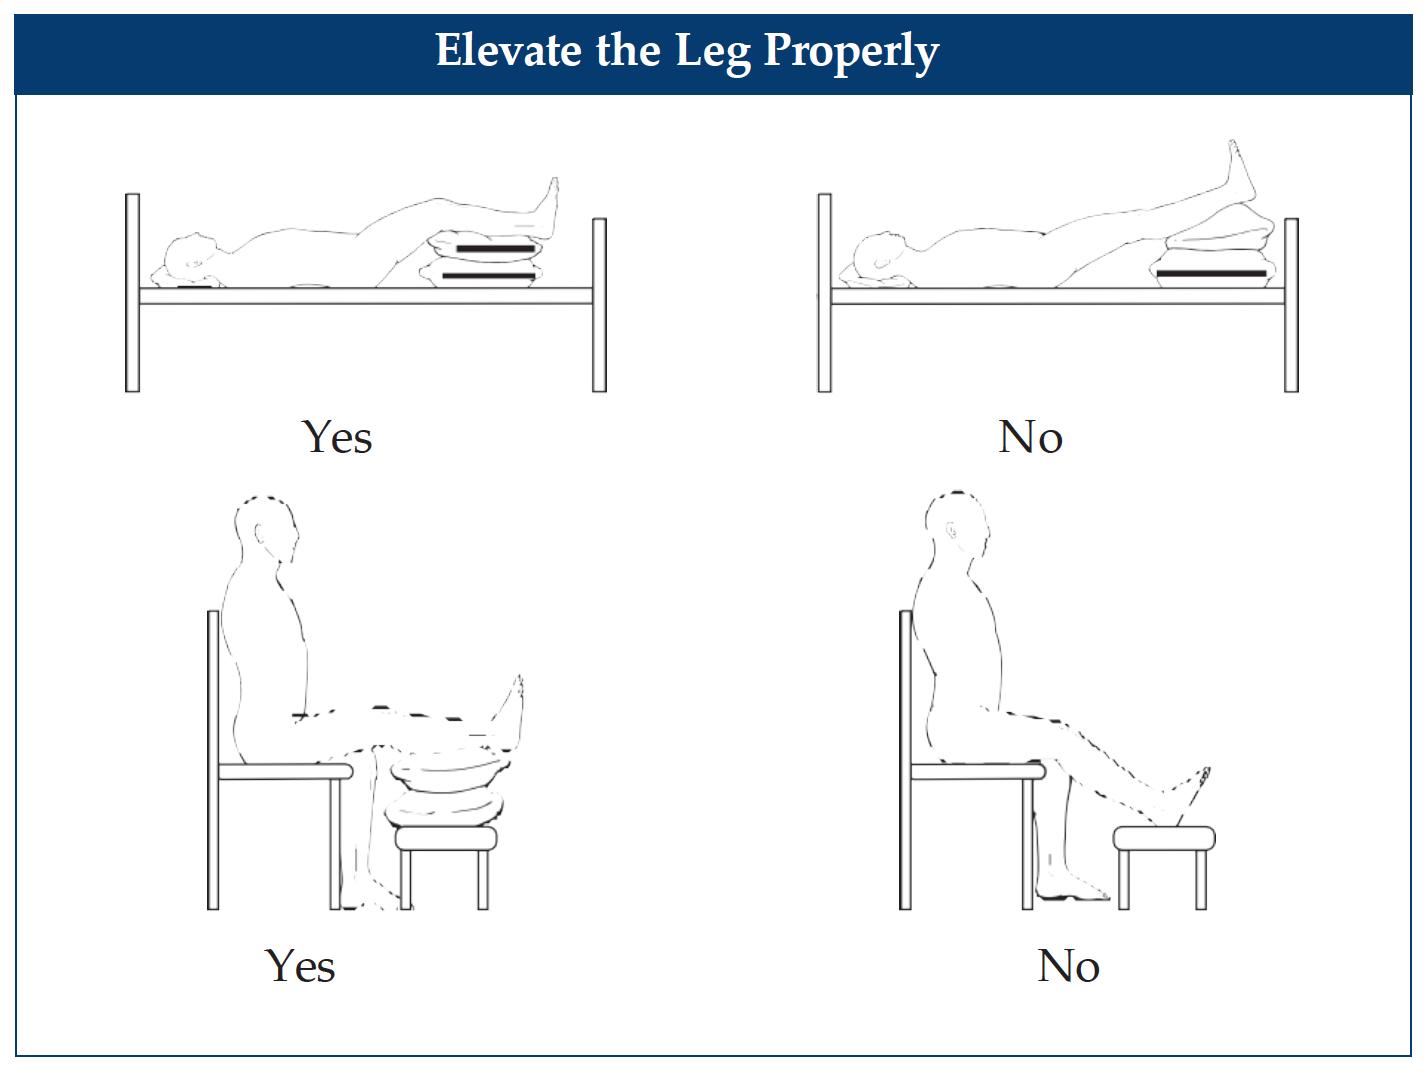 elevate the leg properly